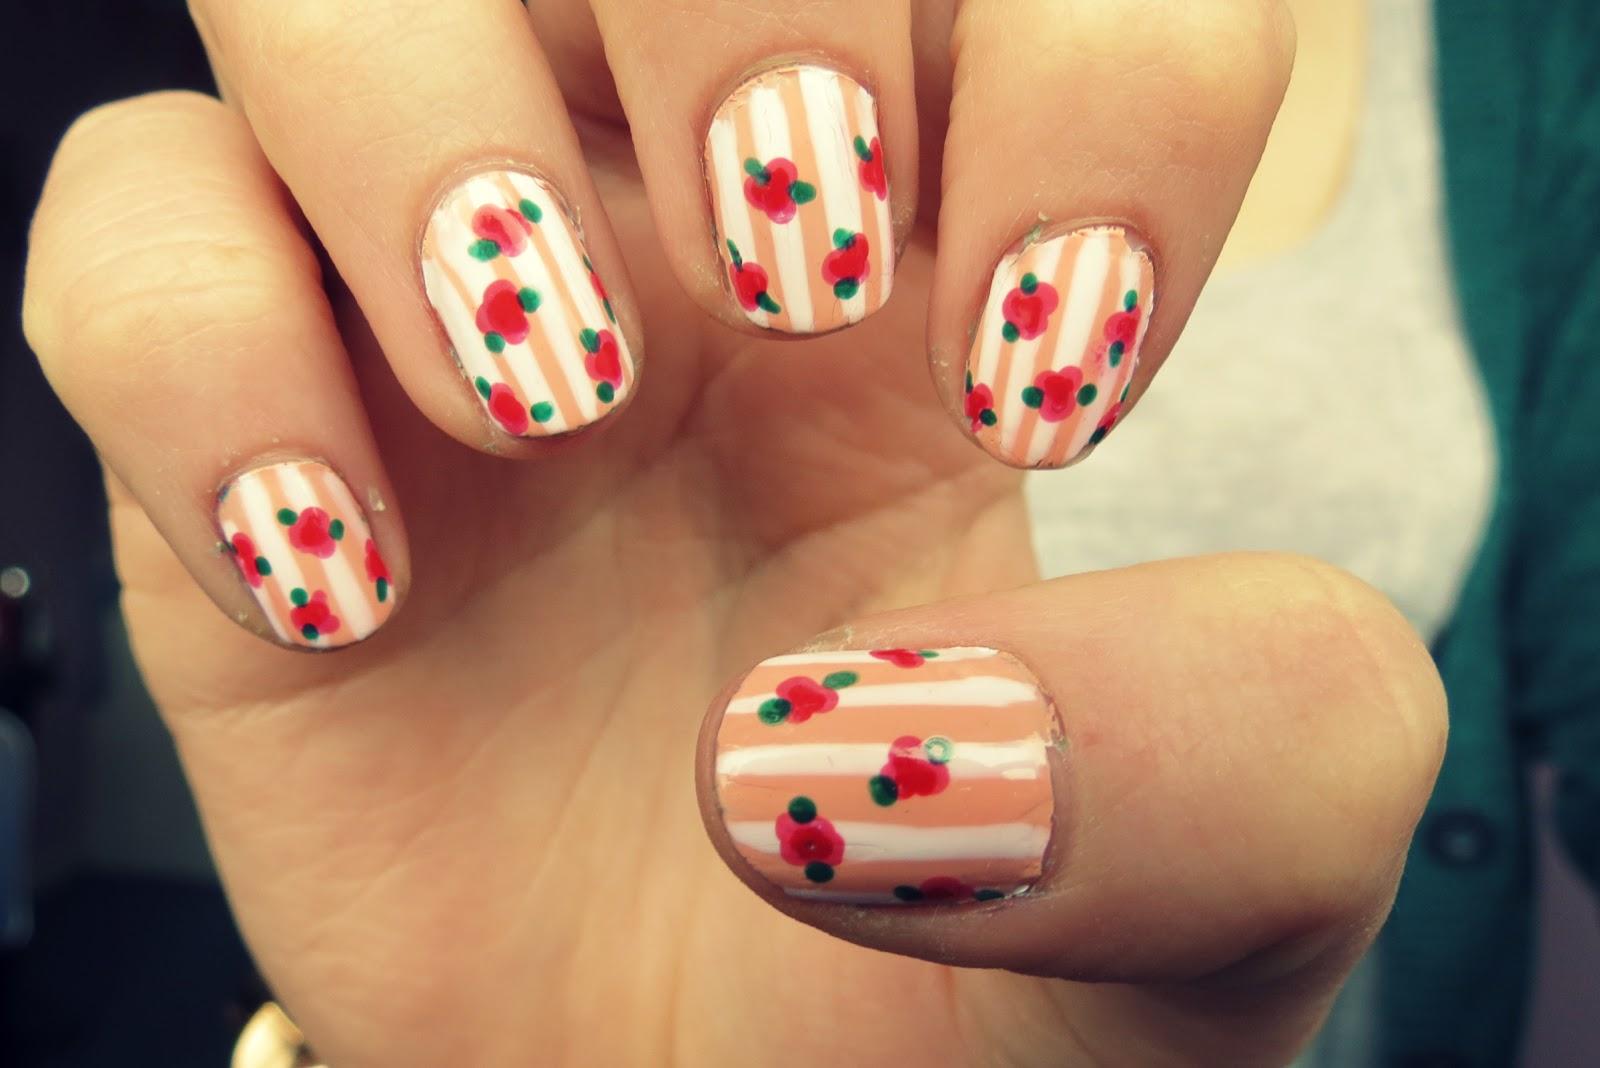 ... UK beauty, fashion and nail art blog: shabby chic cath kidston nails